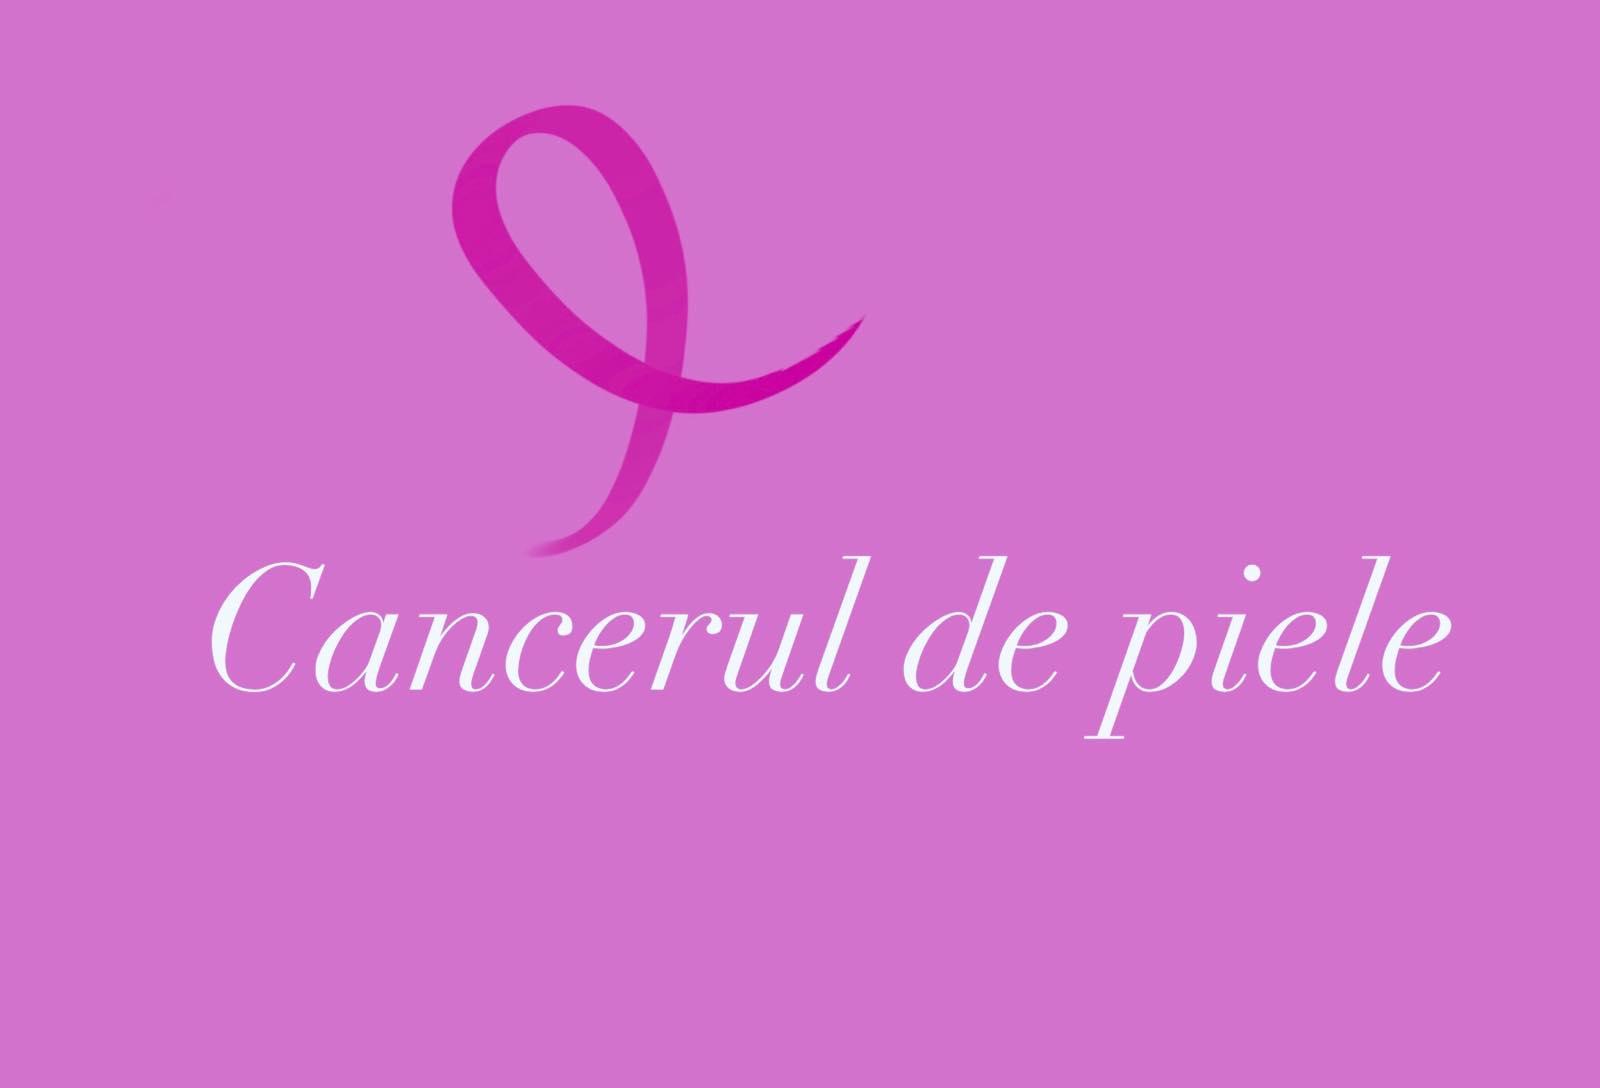 Cancer de piele - Wikipedia